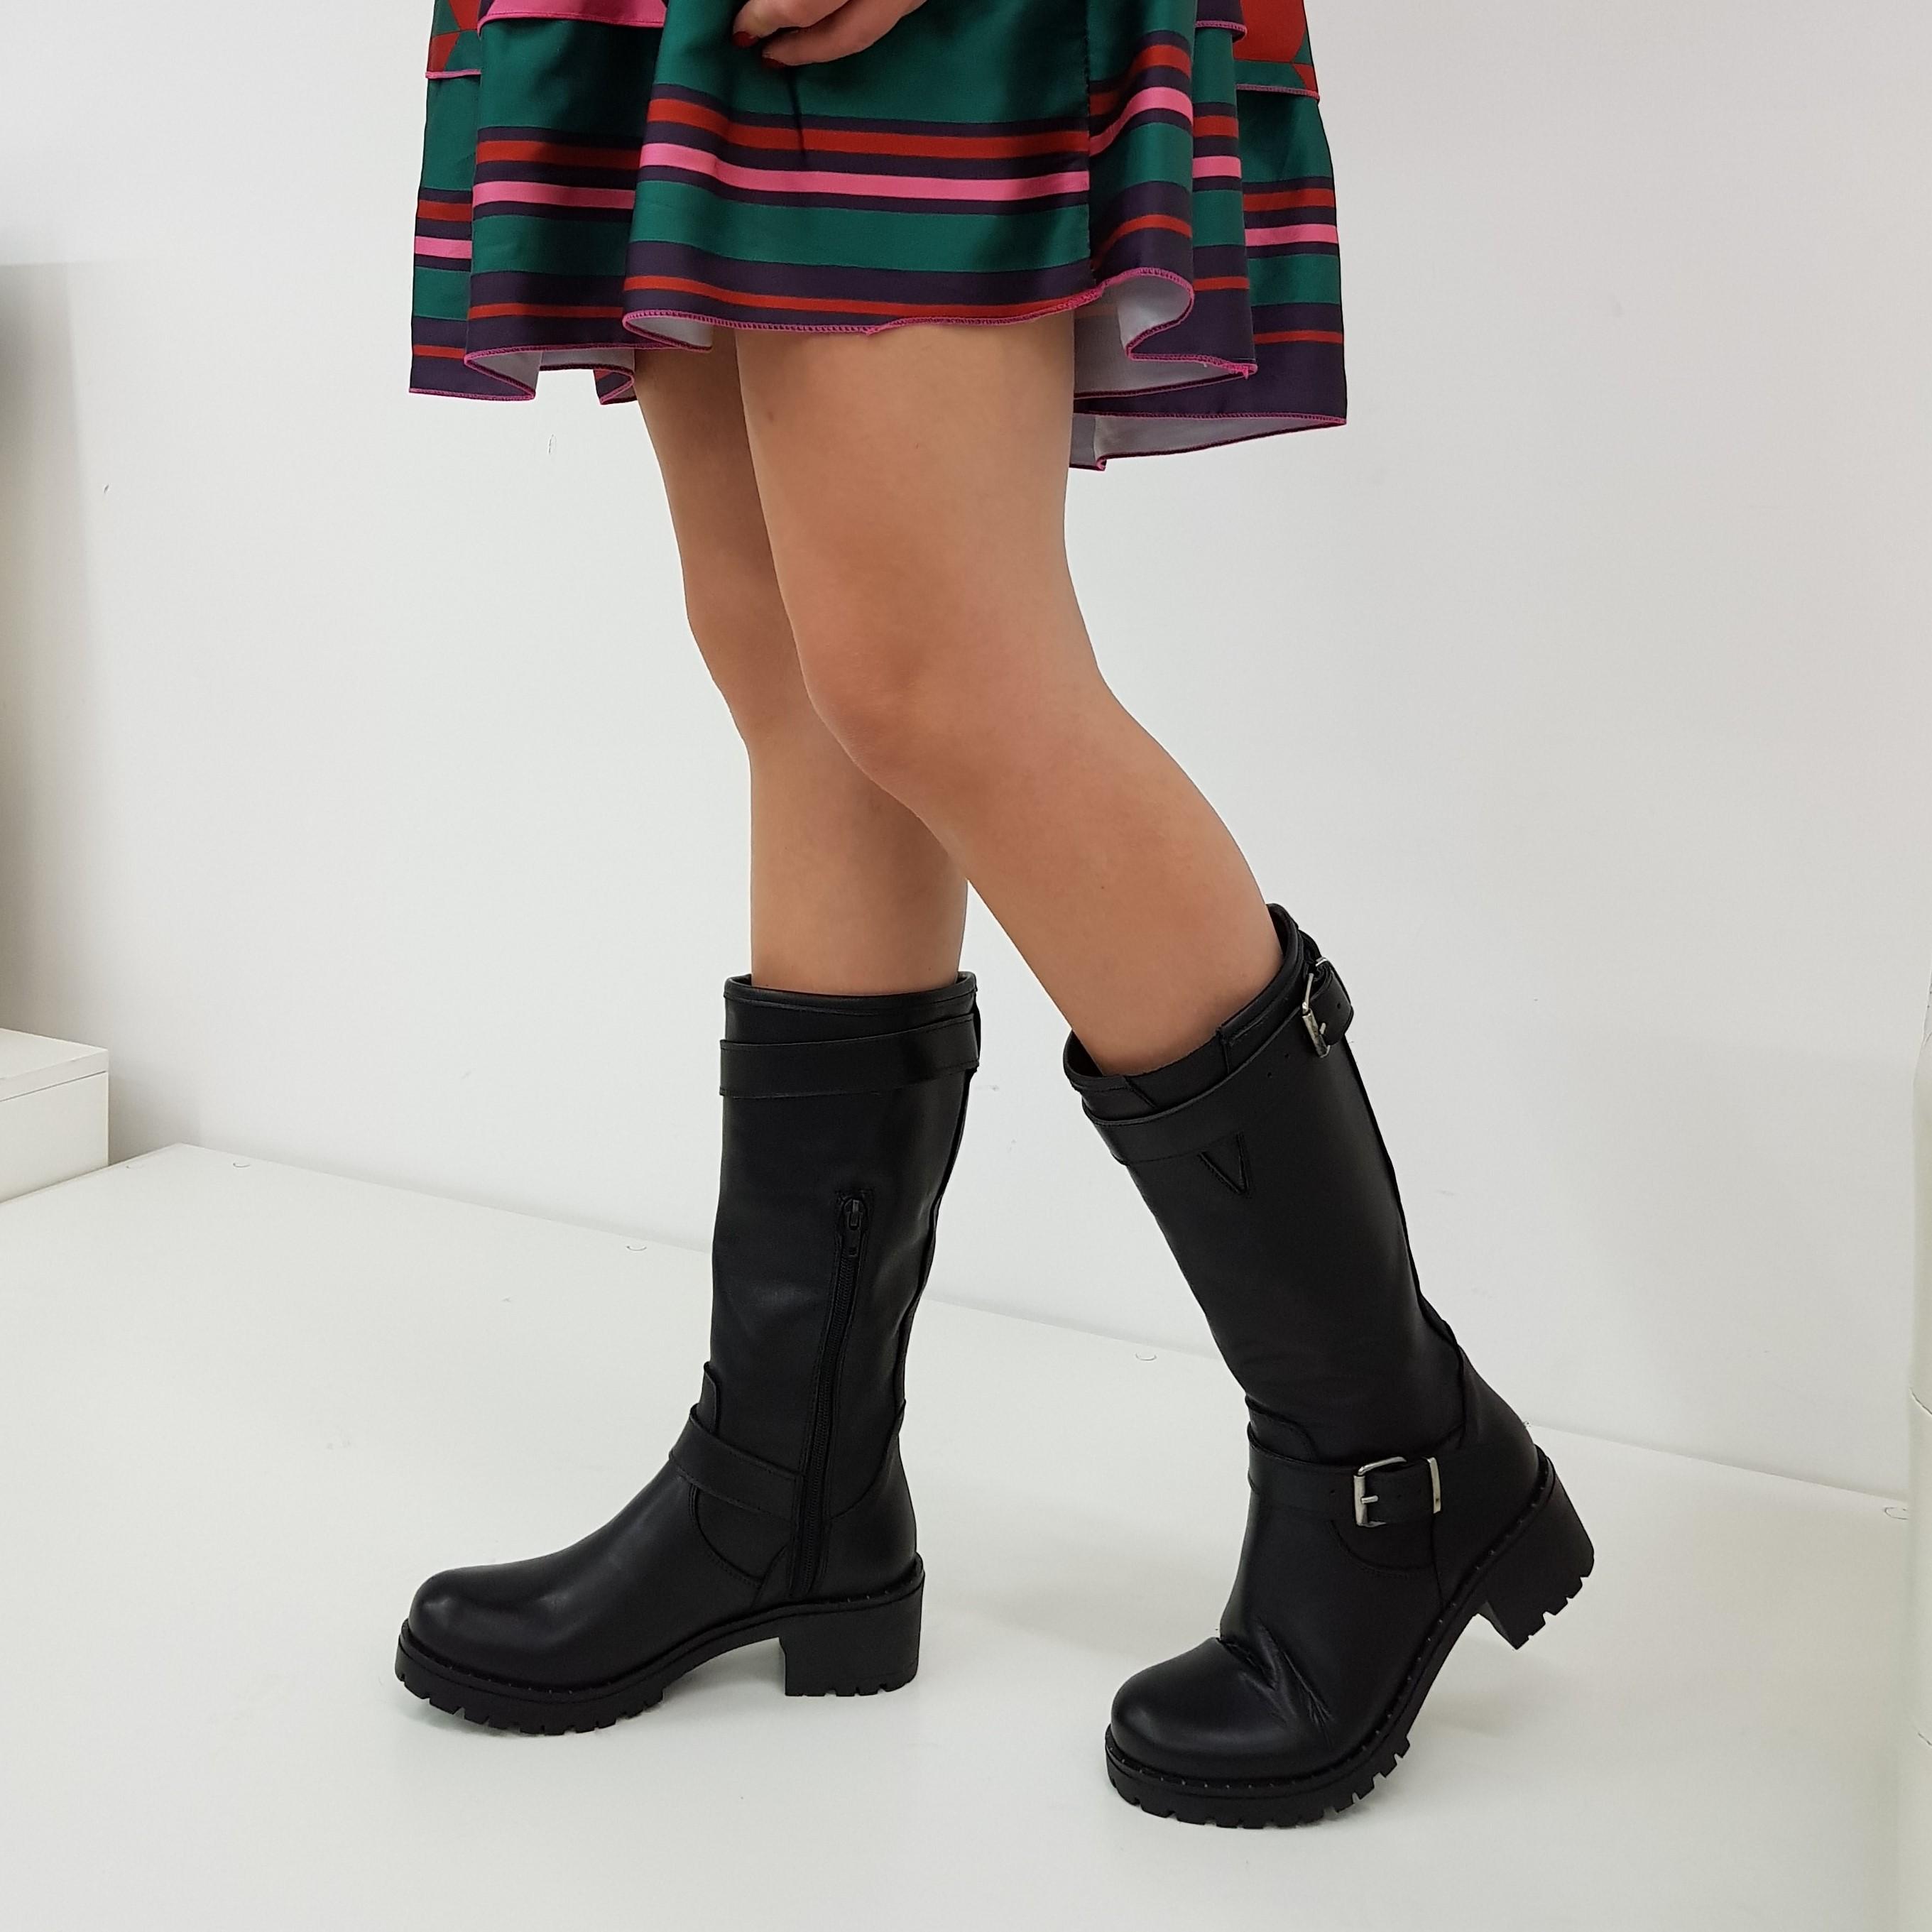 Stivali pelle nero sonya - Lia diva scarpe ...